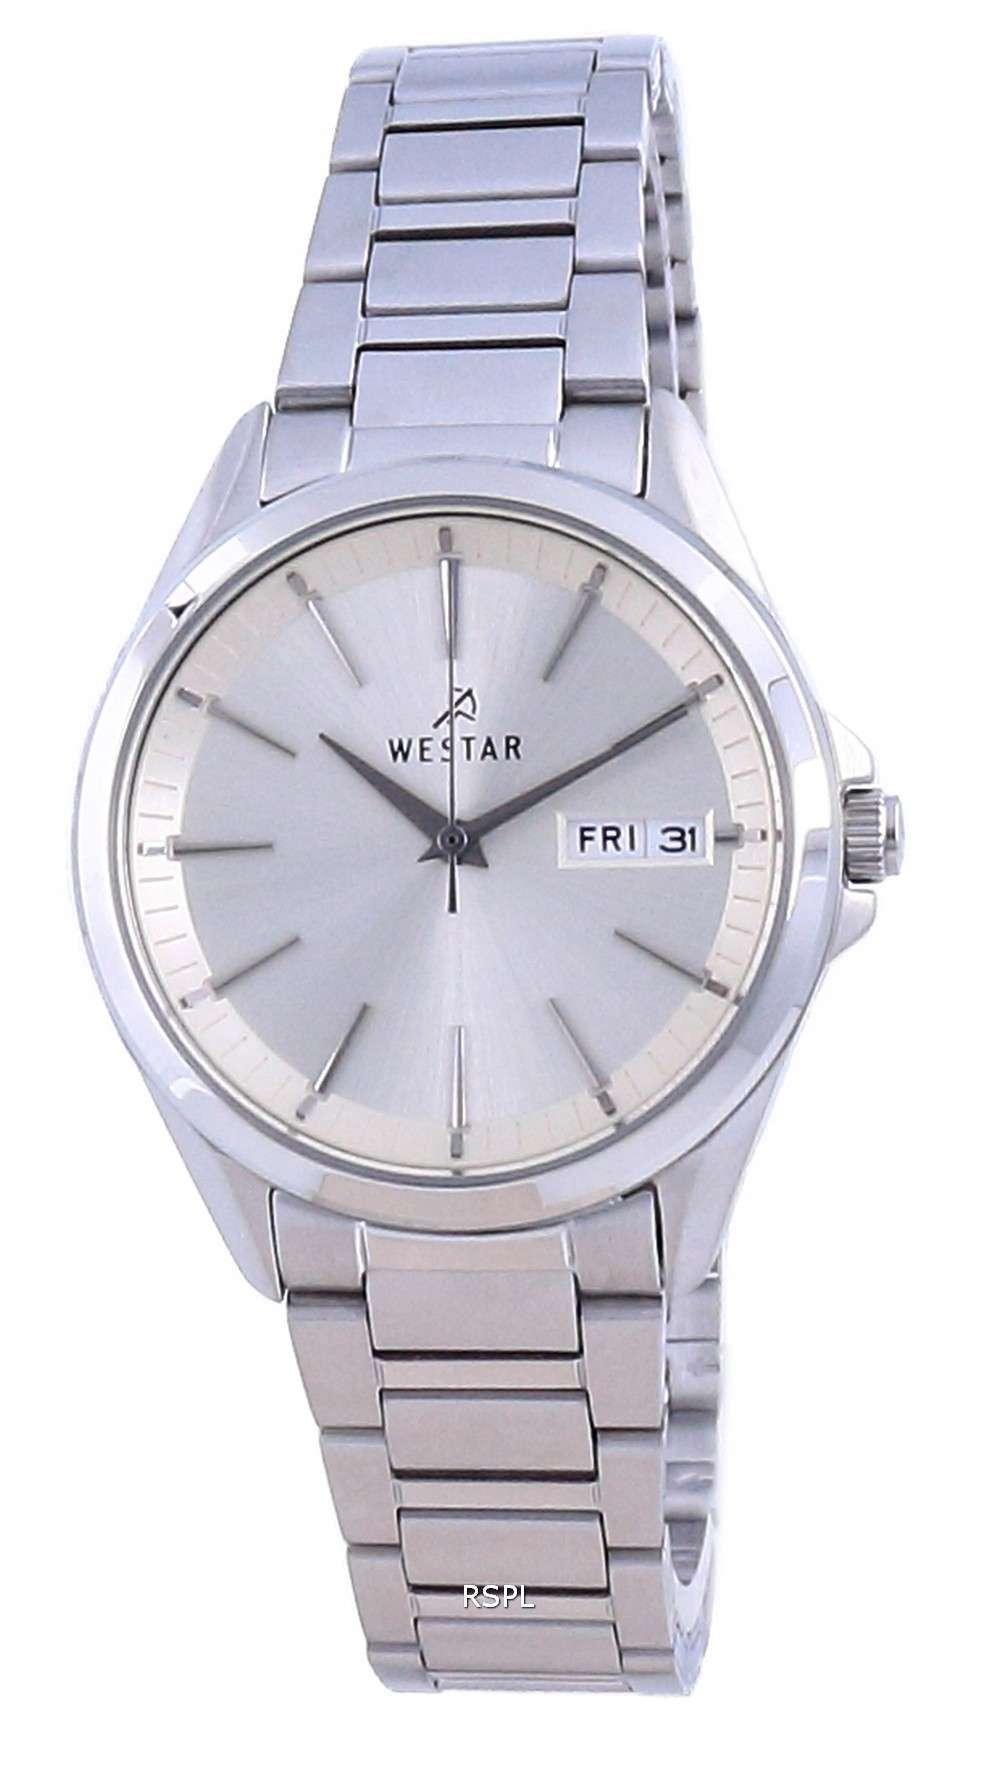 Westar Champagne Dial acero inoxidable cuarzo 40212 STN 102 Reloj para mujer